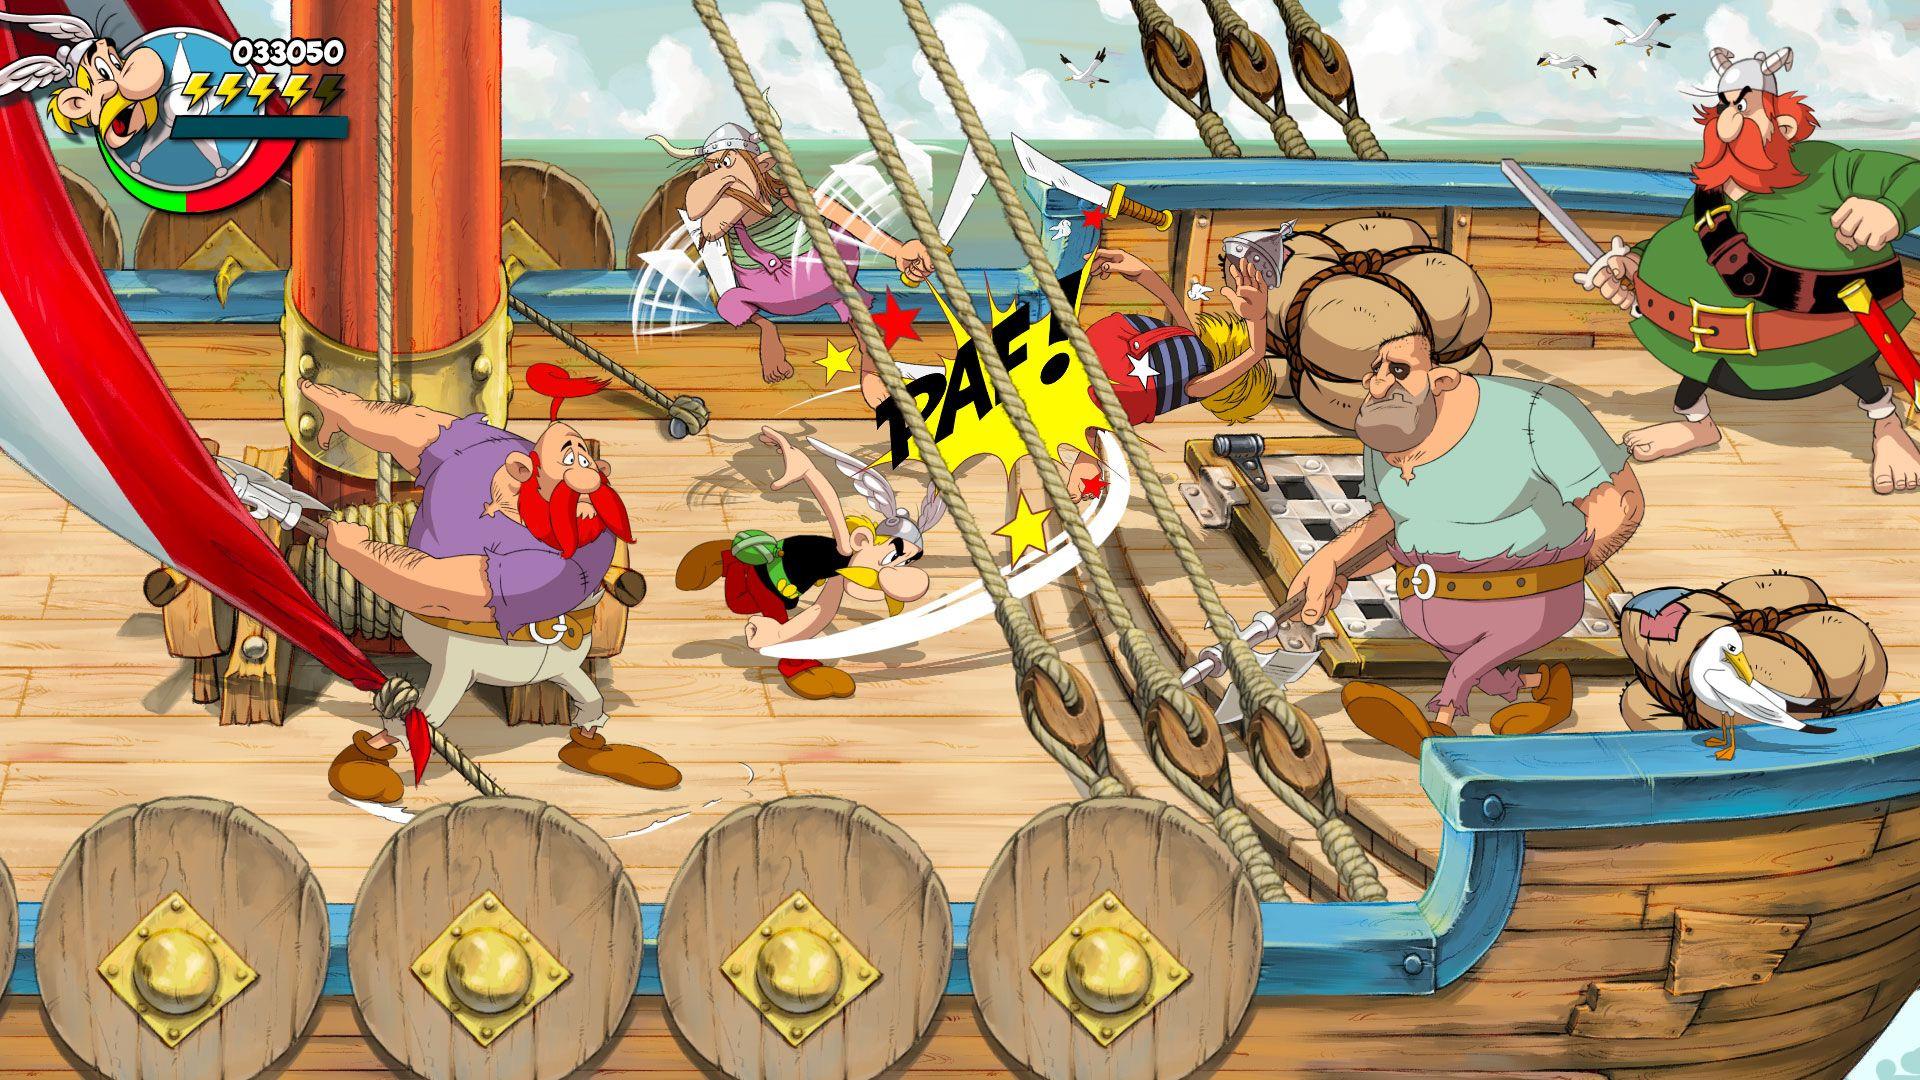 Asterix and Obelix: Slap Them All is a new hand-drawn beat-'em-up screenshot